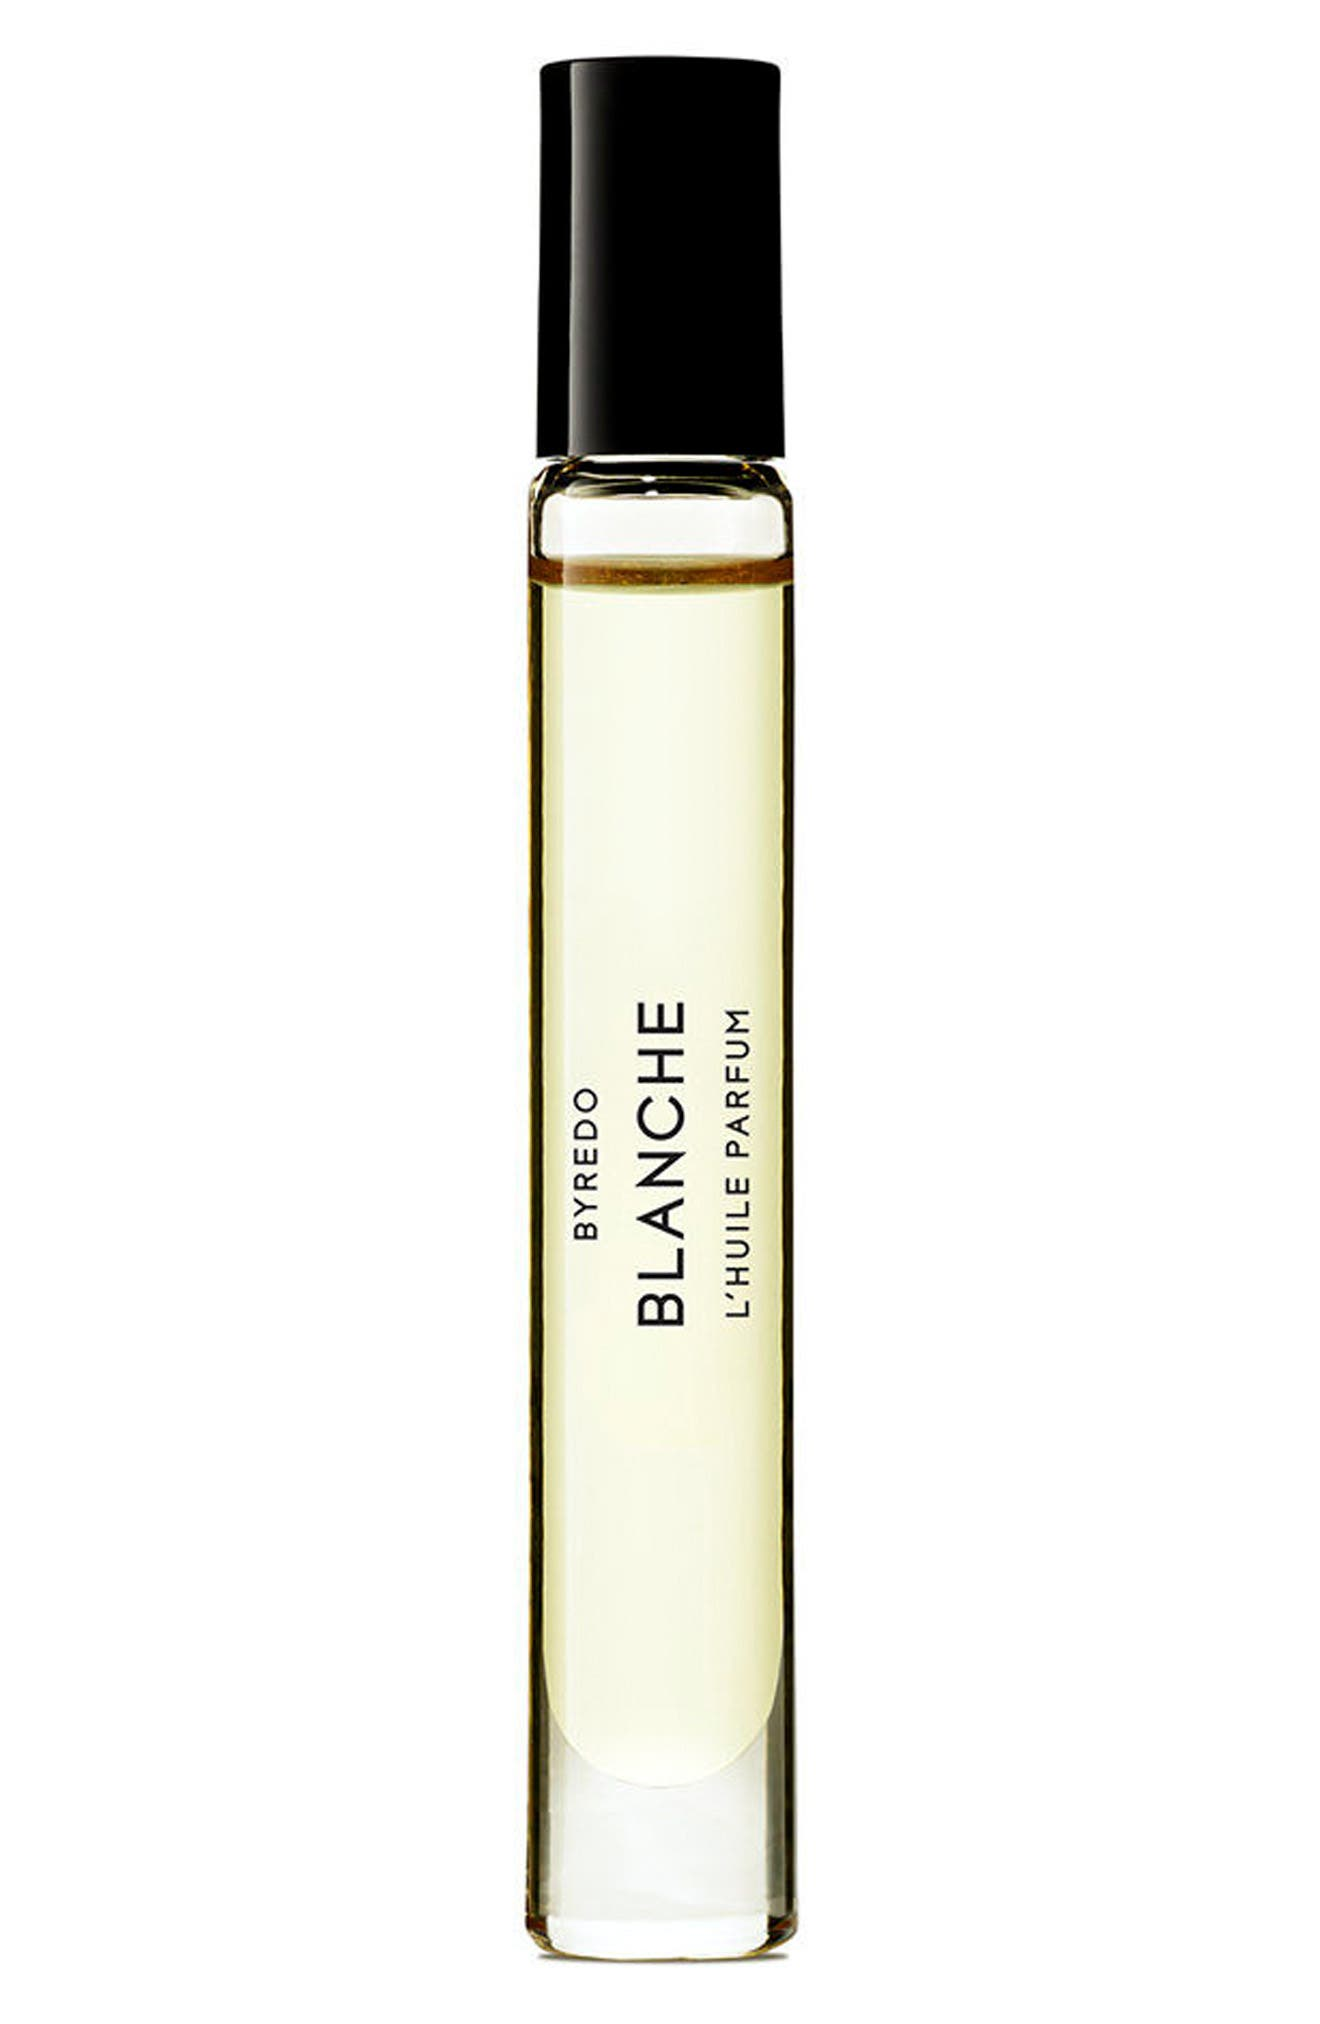 BYREDO Blanche Eau de Parfum Rollerball